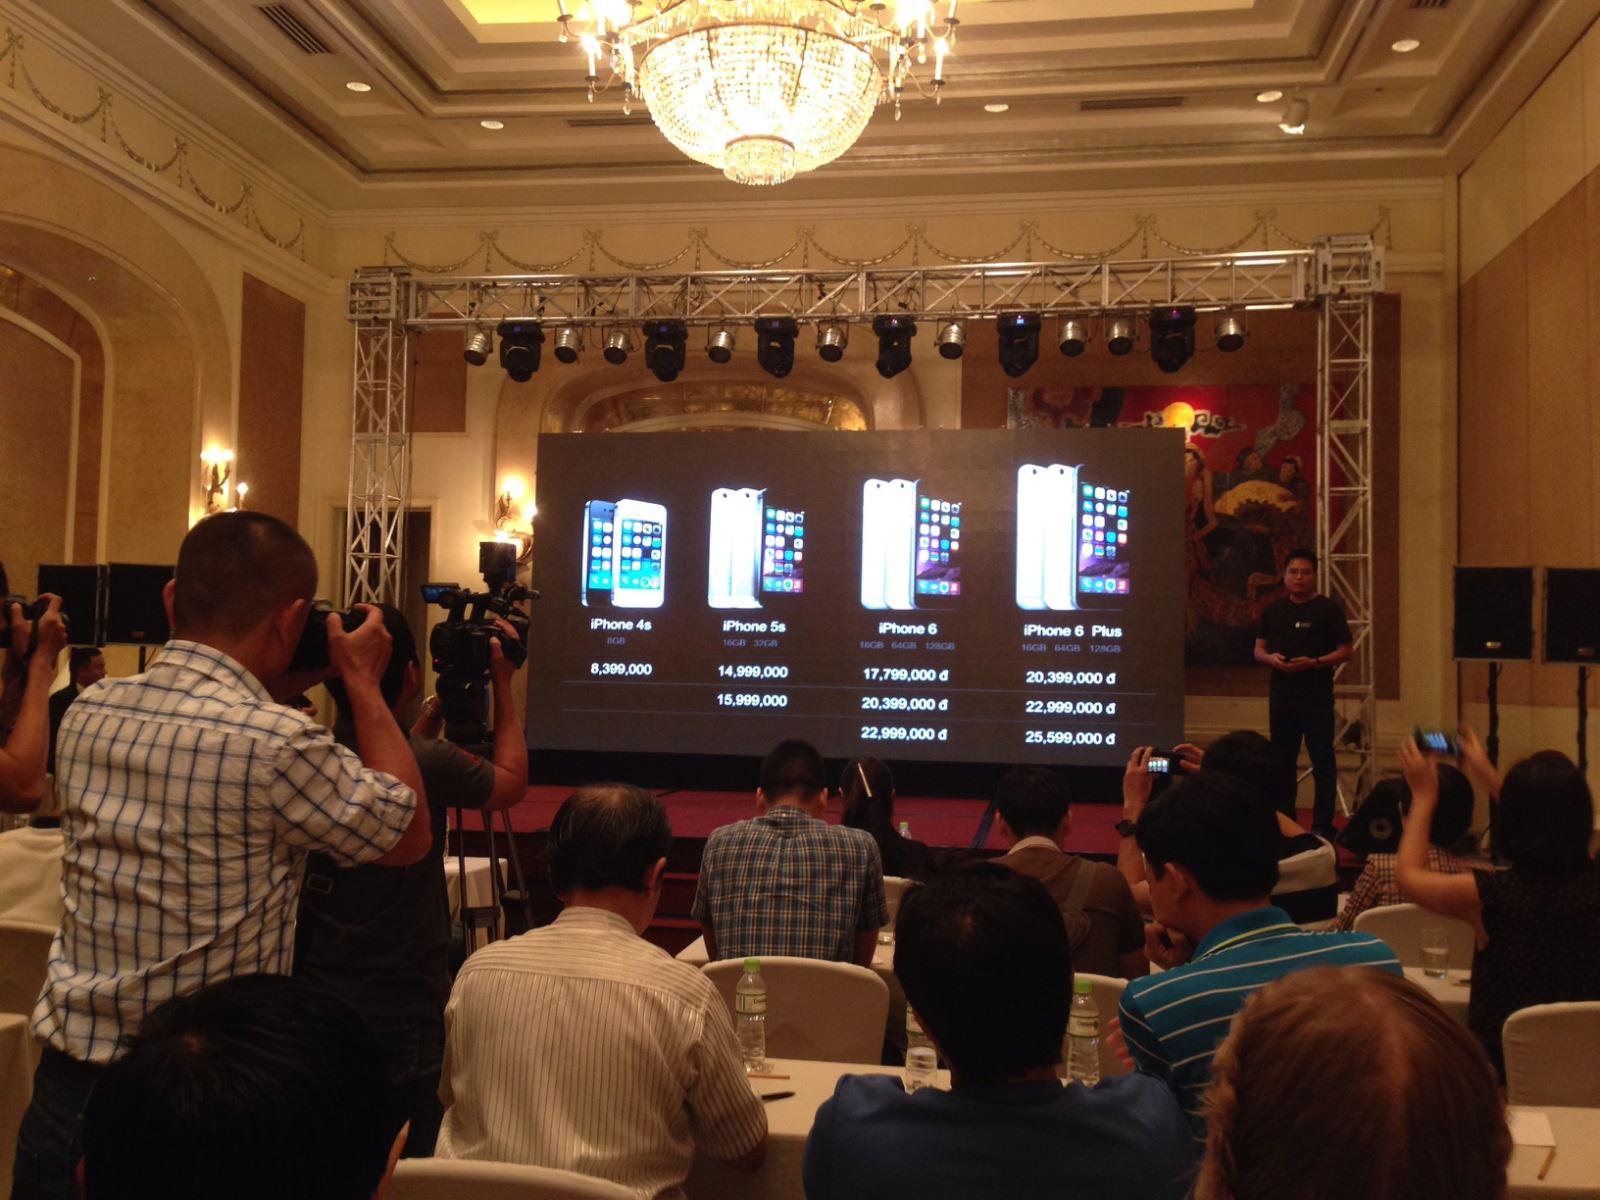 Giới thiệu iPhone 6 tại Việt Nam